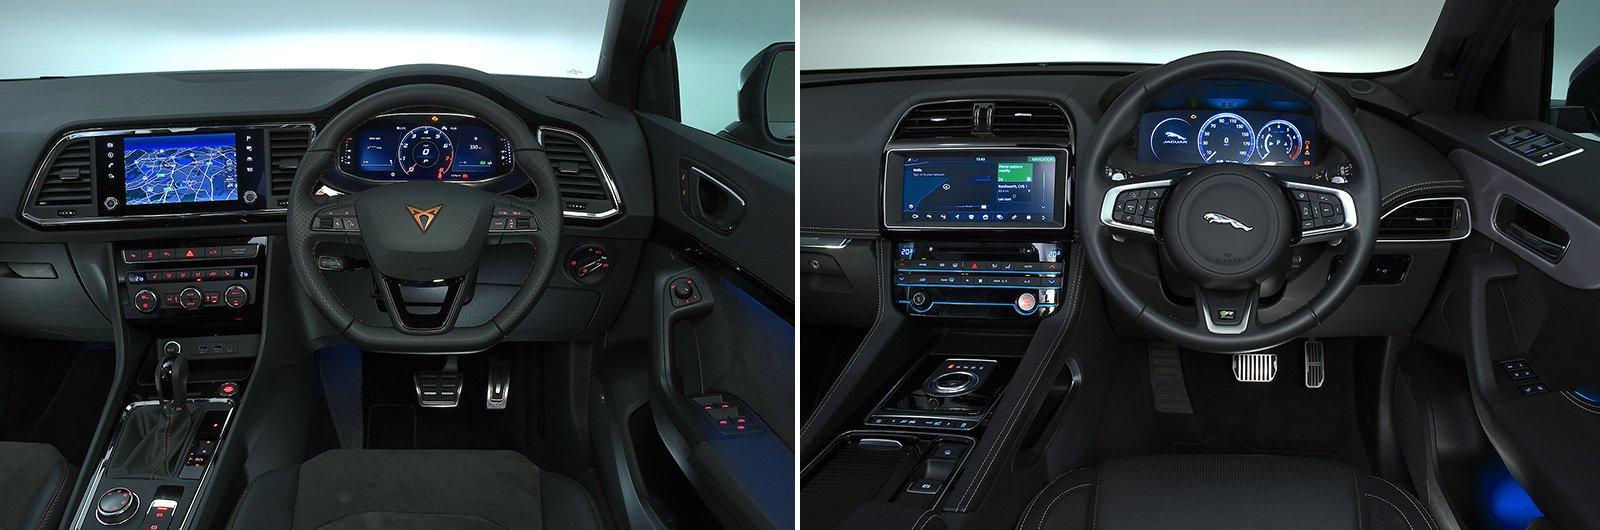 New Cupra Ateca vs used Jaguar F-Pace interior